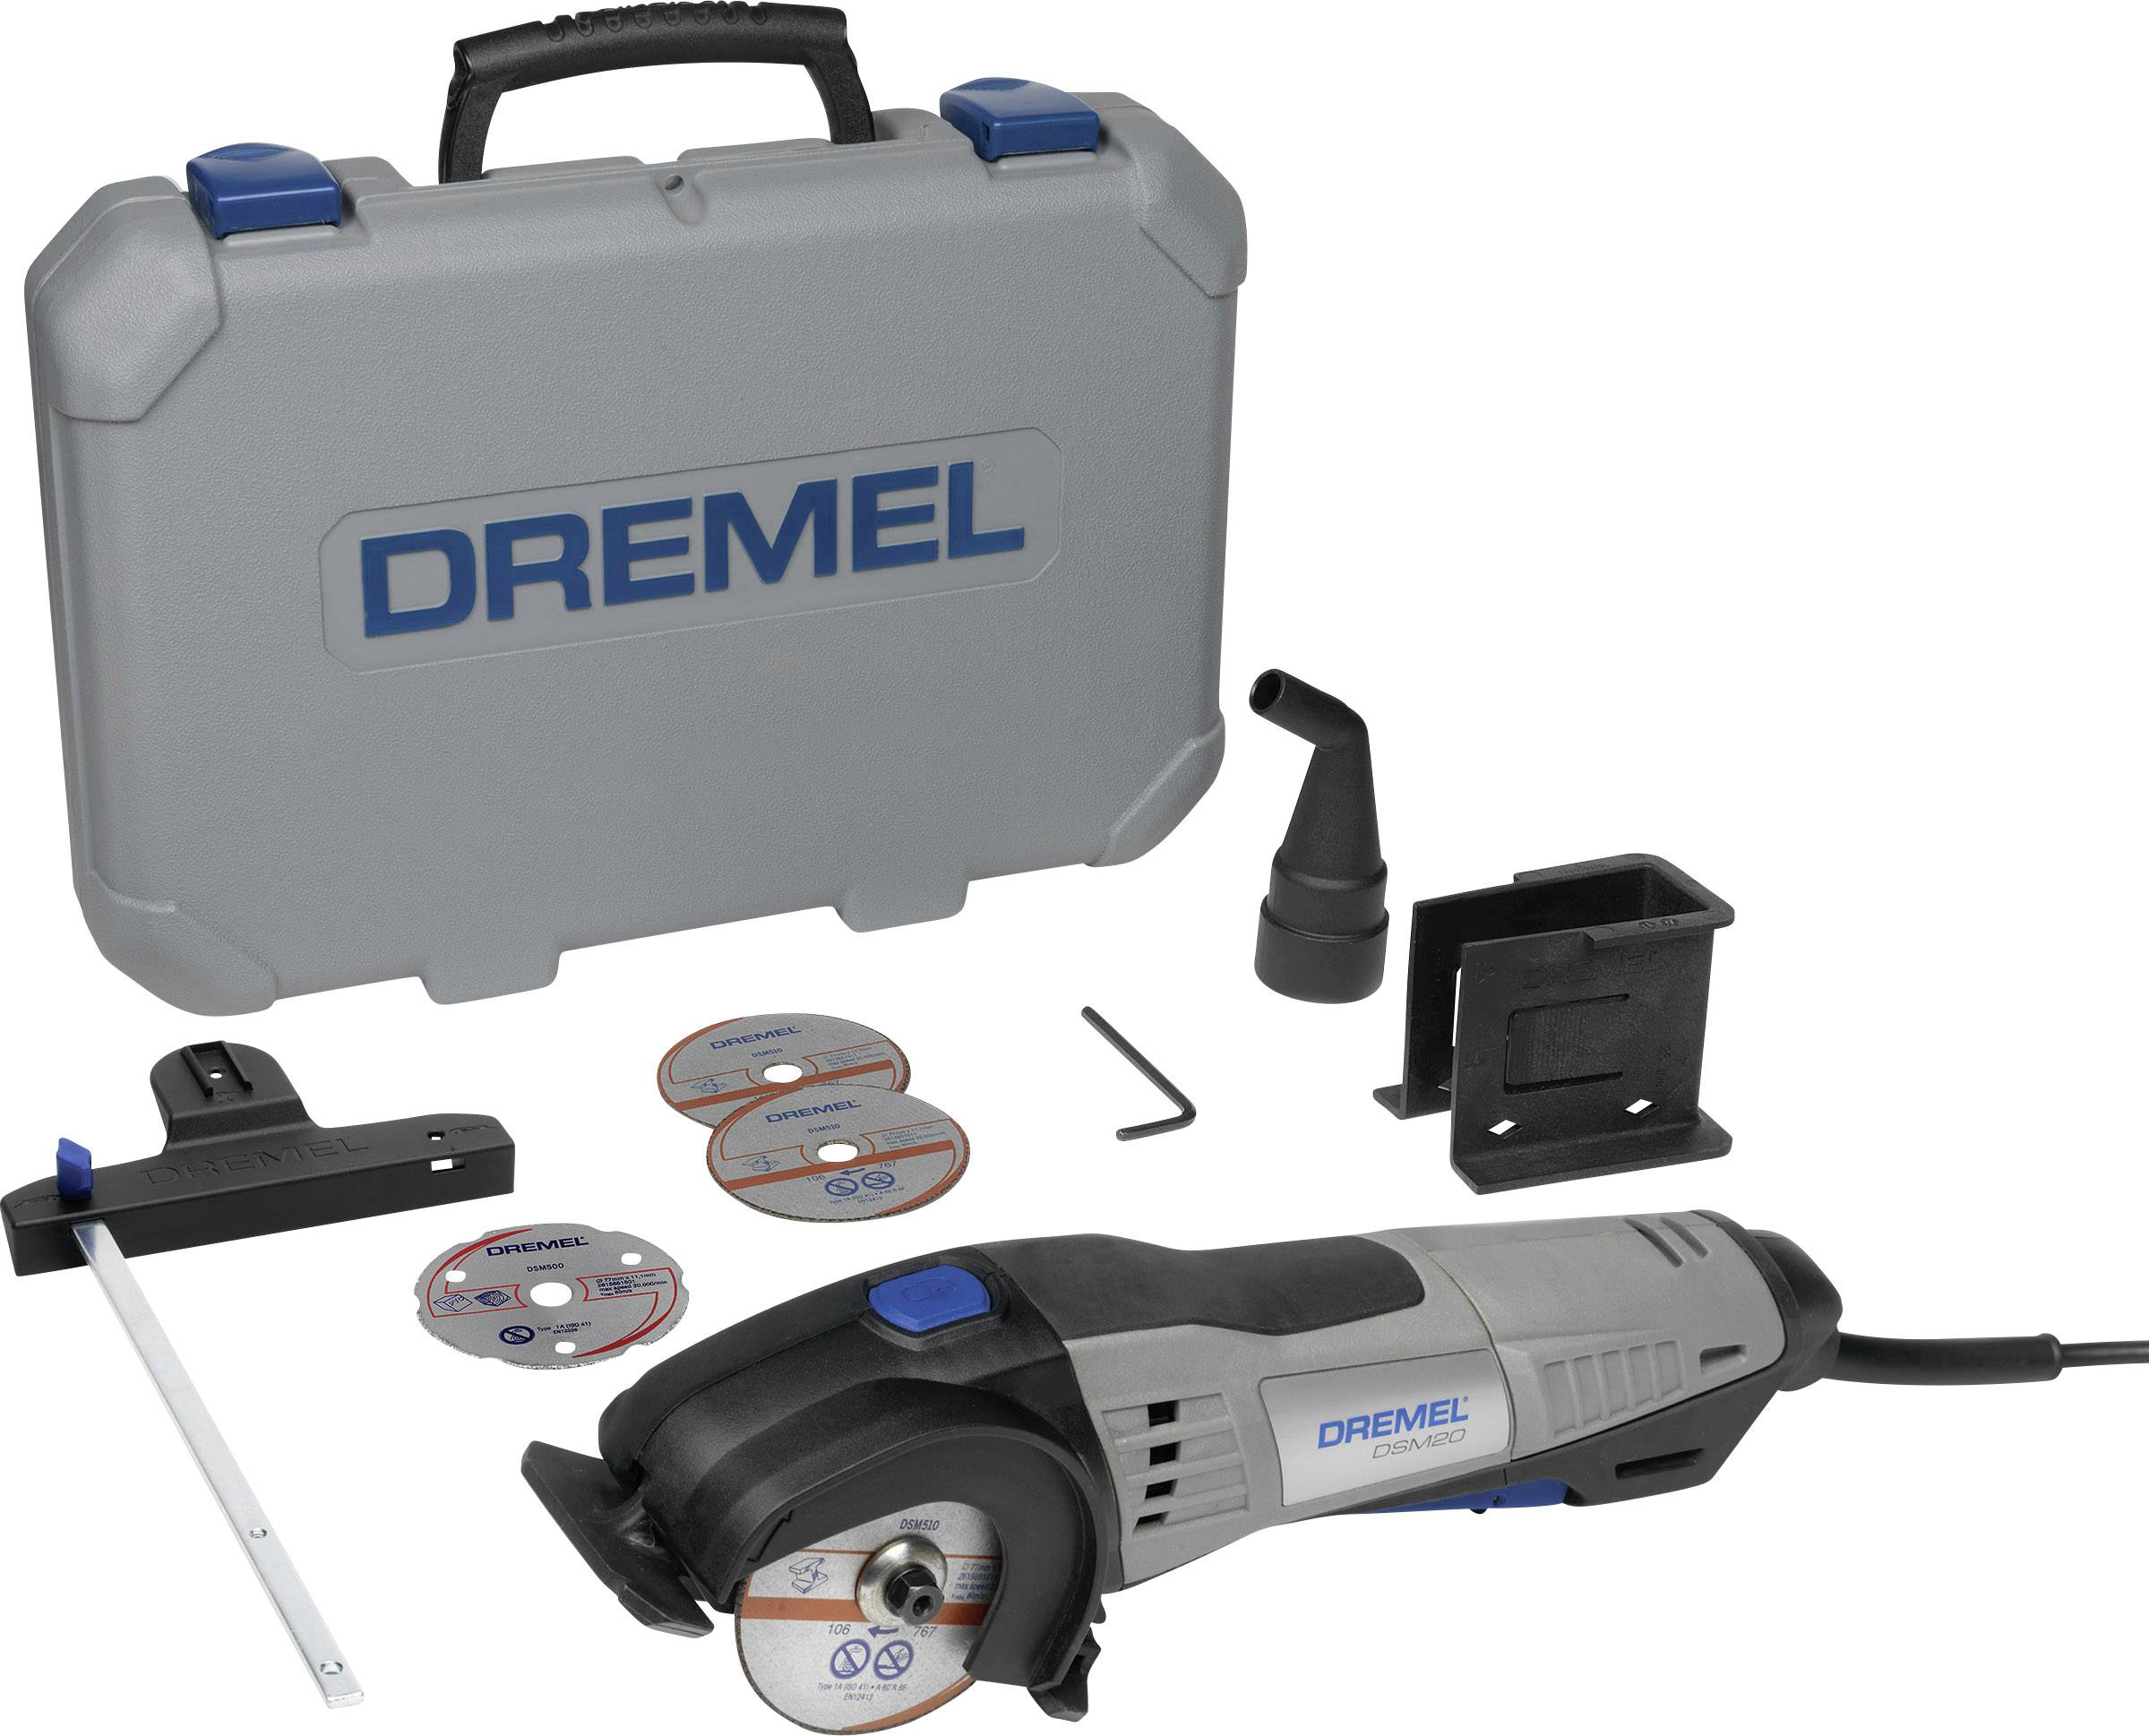 Dremel 2615S840JA DSM840 Saw-Max Mitre Guide Attachment